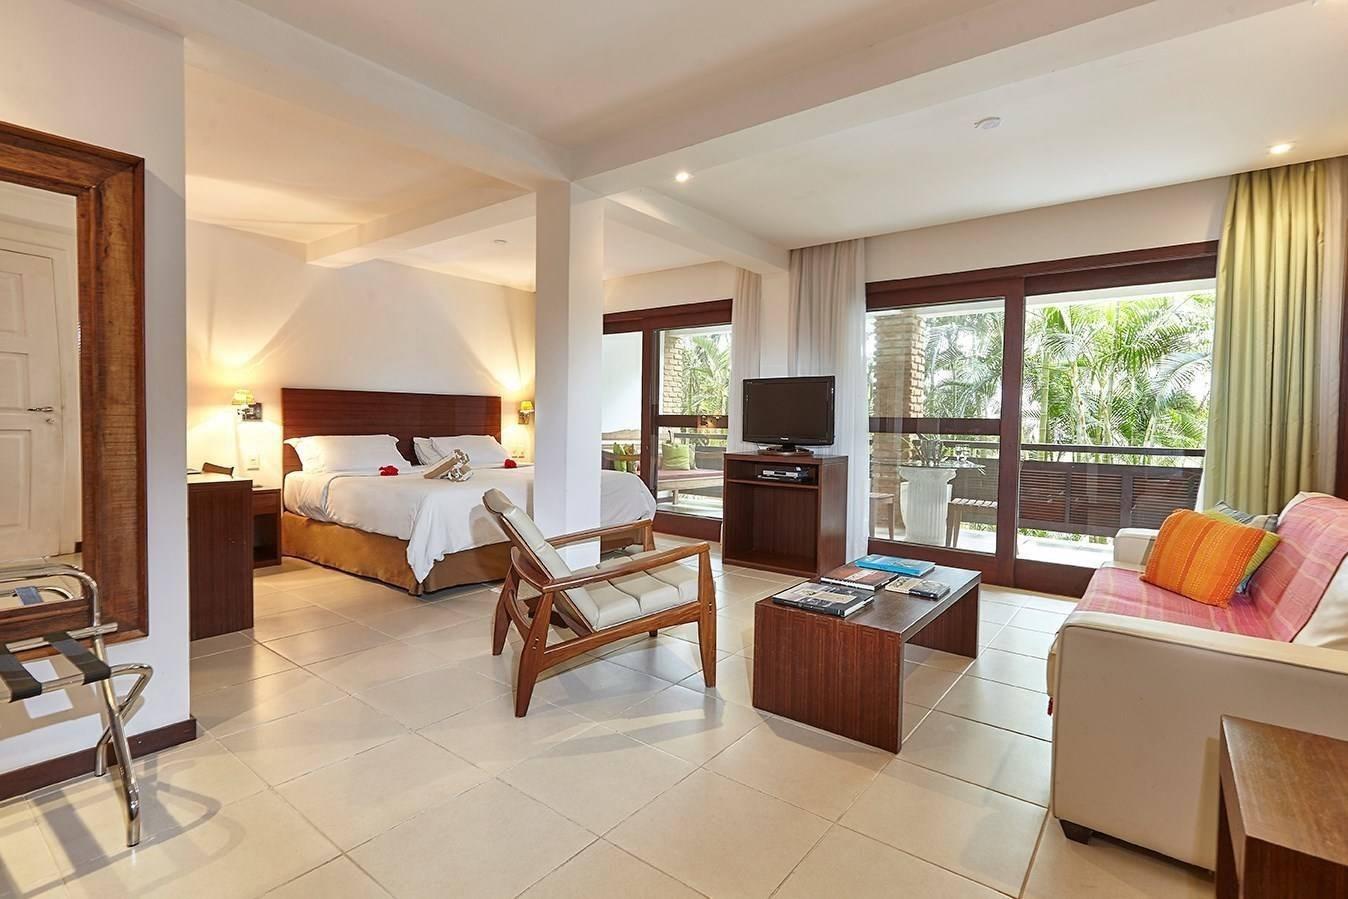 Hotel PortoBay Búzios - Búzios - Suite Master